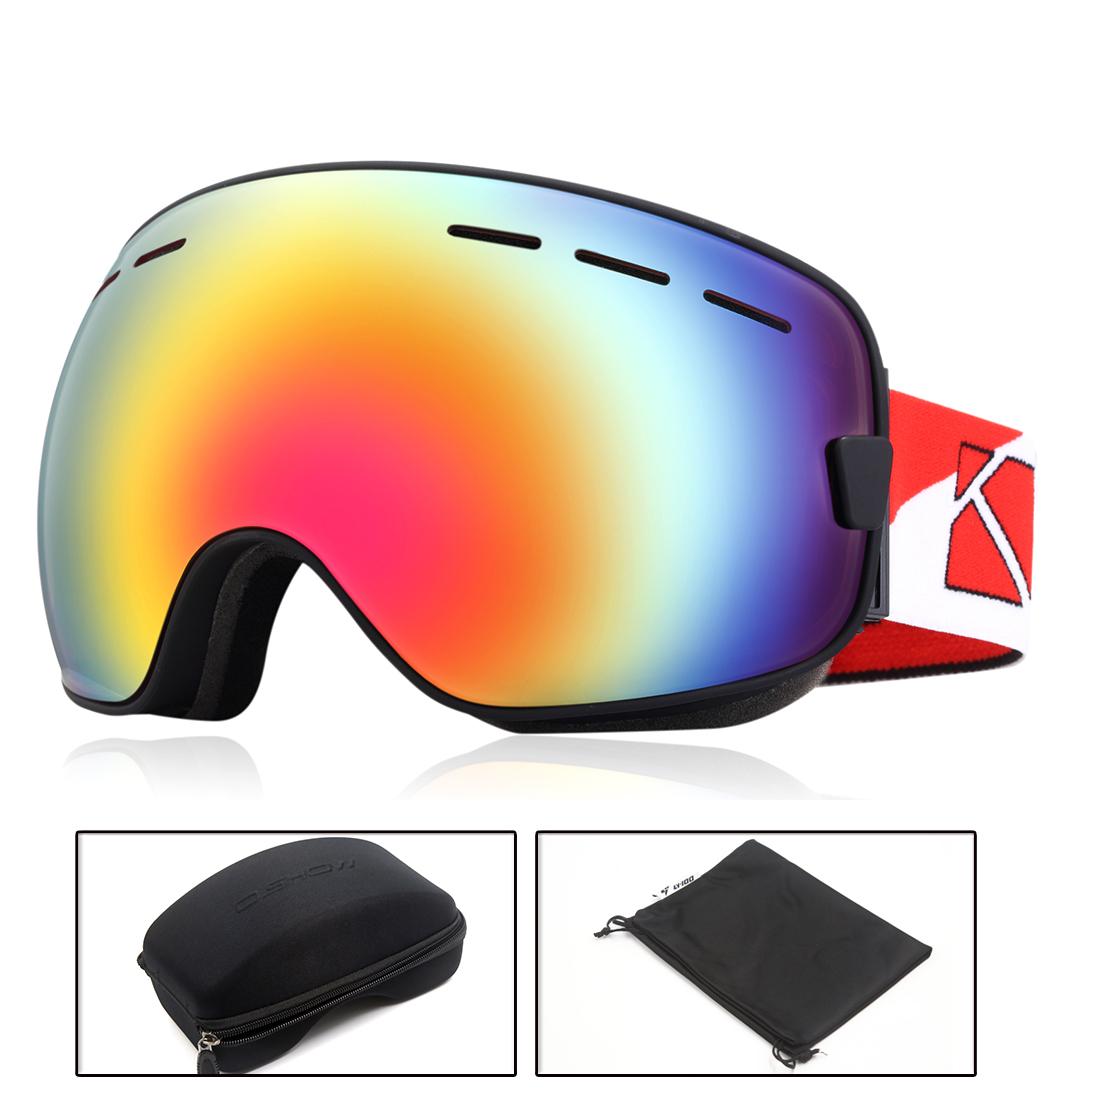 O'show Ski Snowmobile Snowboard Goggles Anti-fog UV400 Protect Unisex Glass Bk by